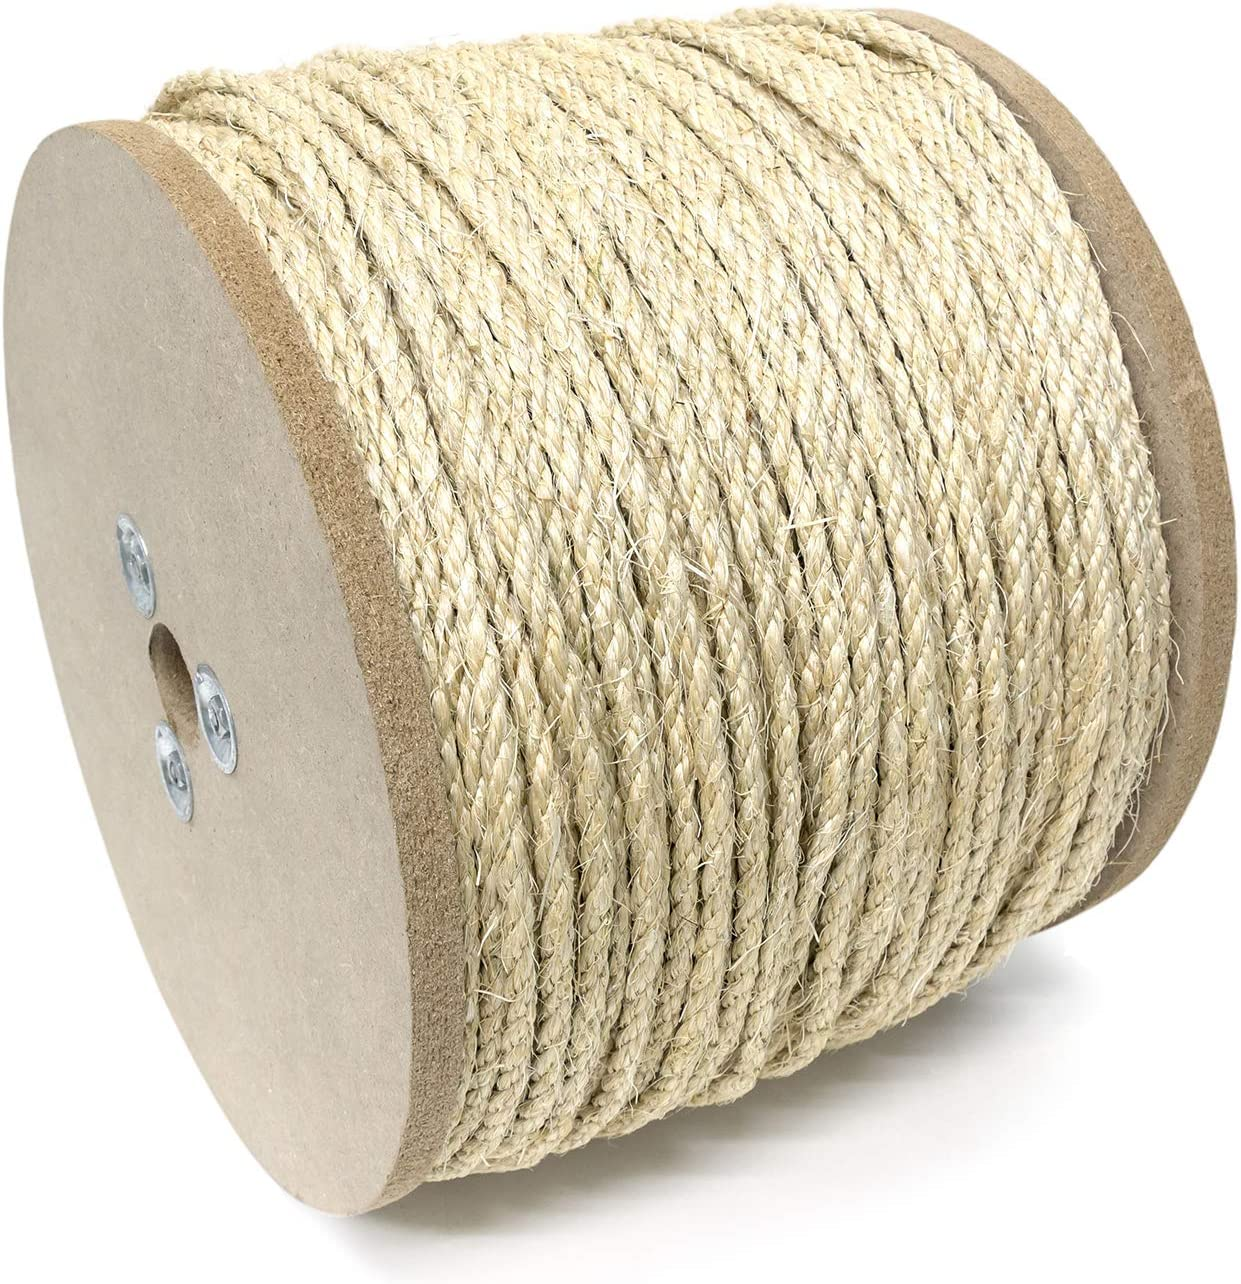 "KingCord 309731 Sisal Twisted Rope Reel 3/4"" x 150', Natural"